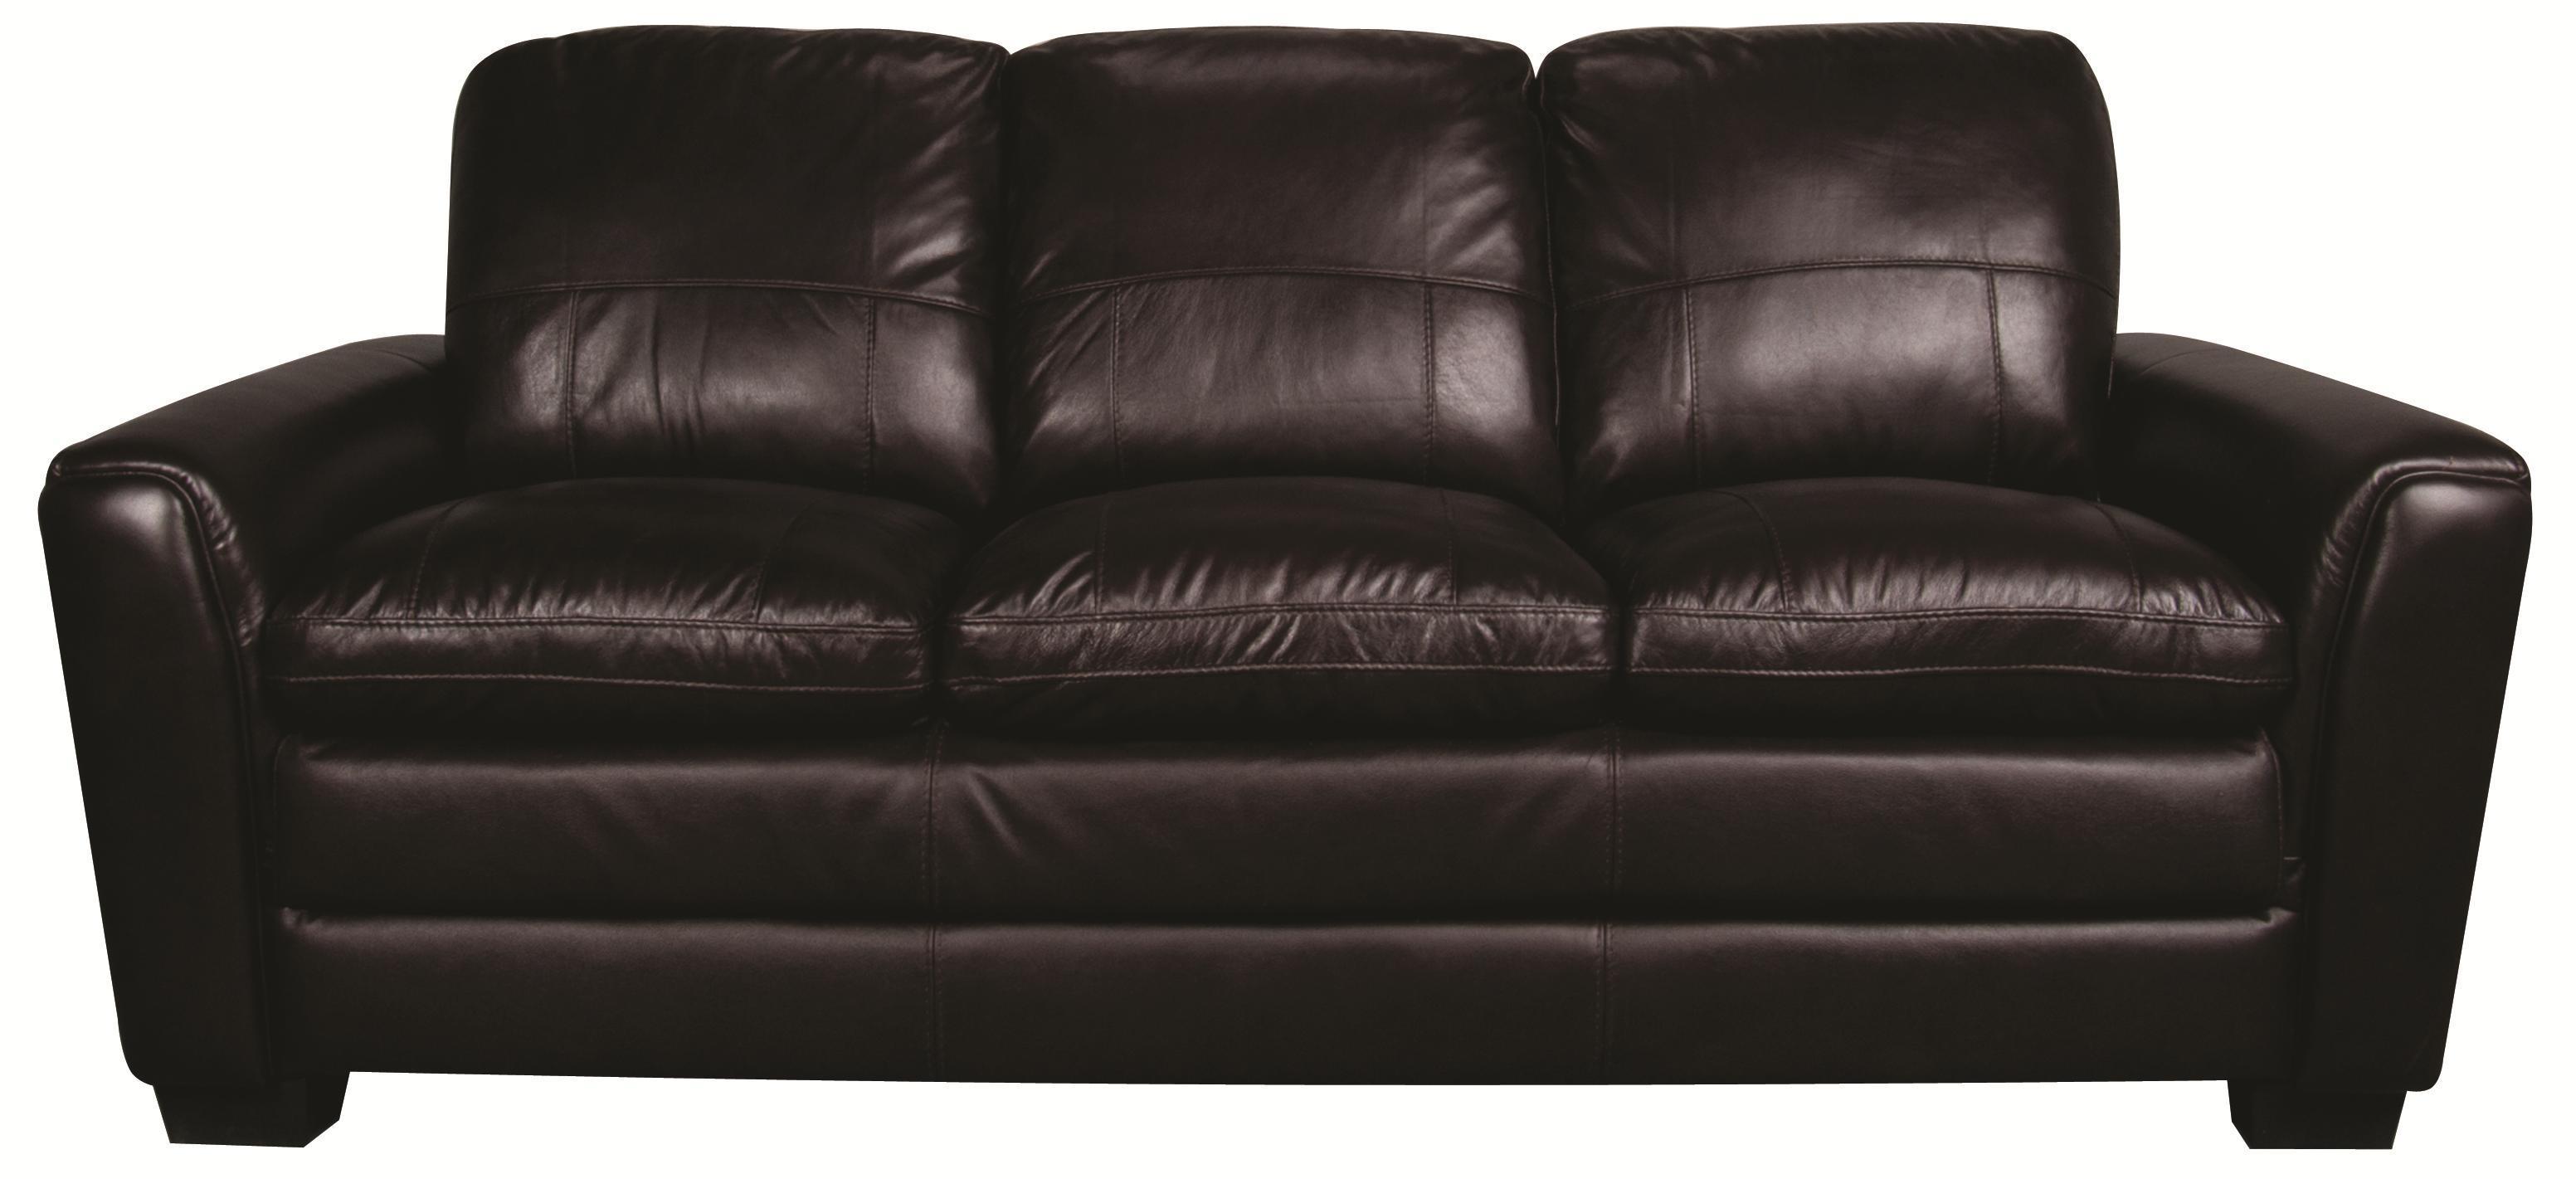 Morris Home Furnishings Rowan Rowan 100% Leather Sofa - Item Number: 103850017